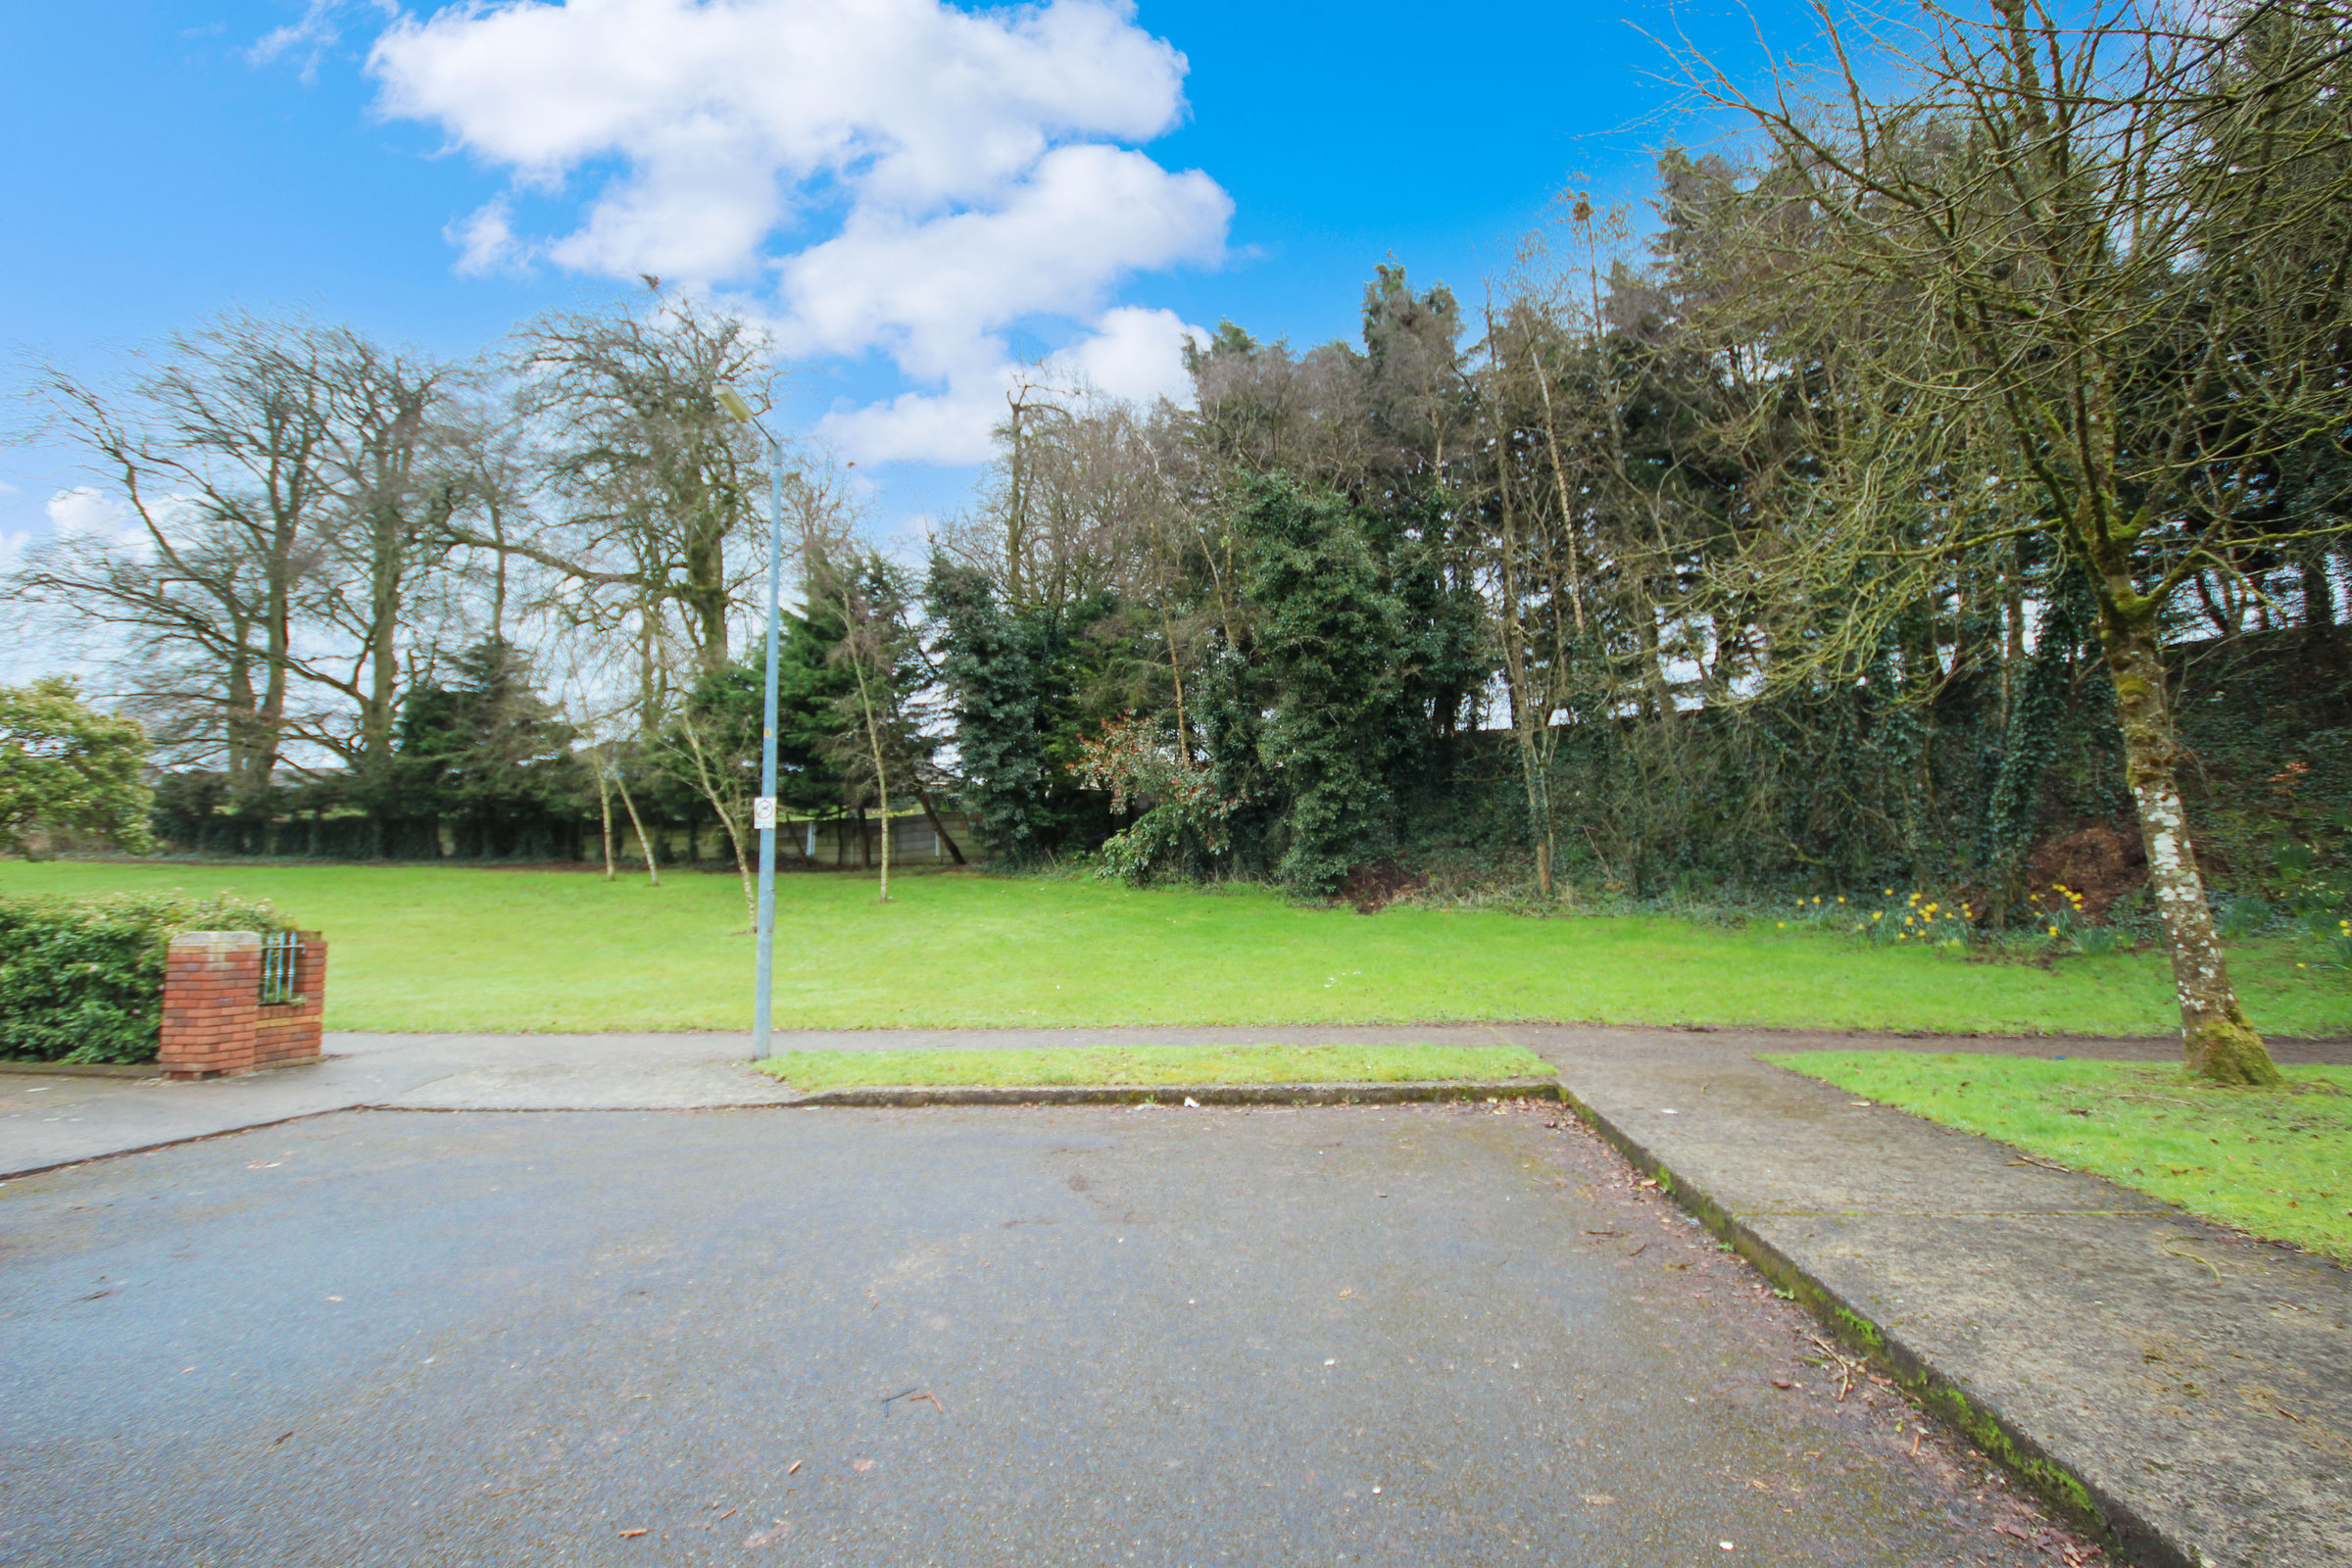 13 Beechdale Way, Blessington, Co. Wicklow